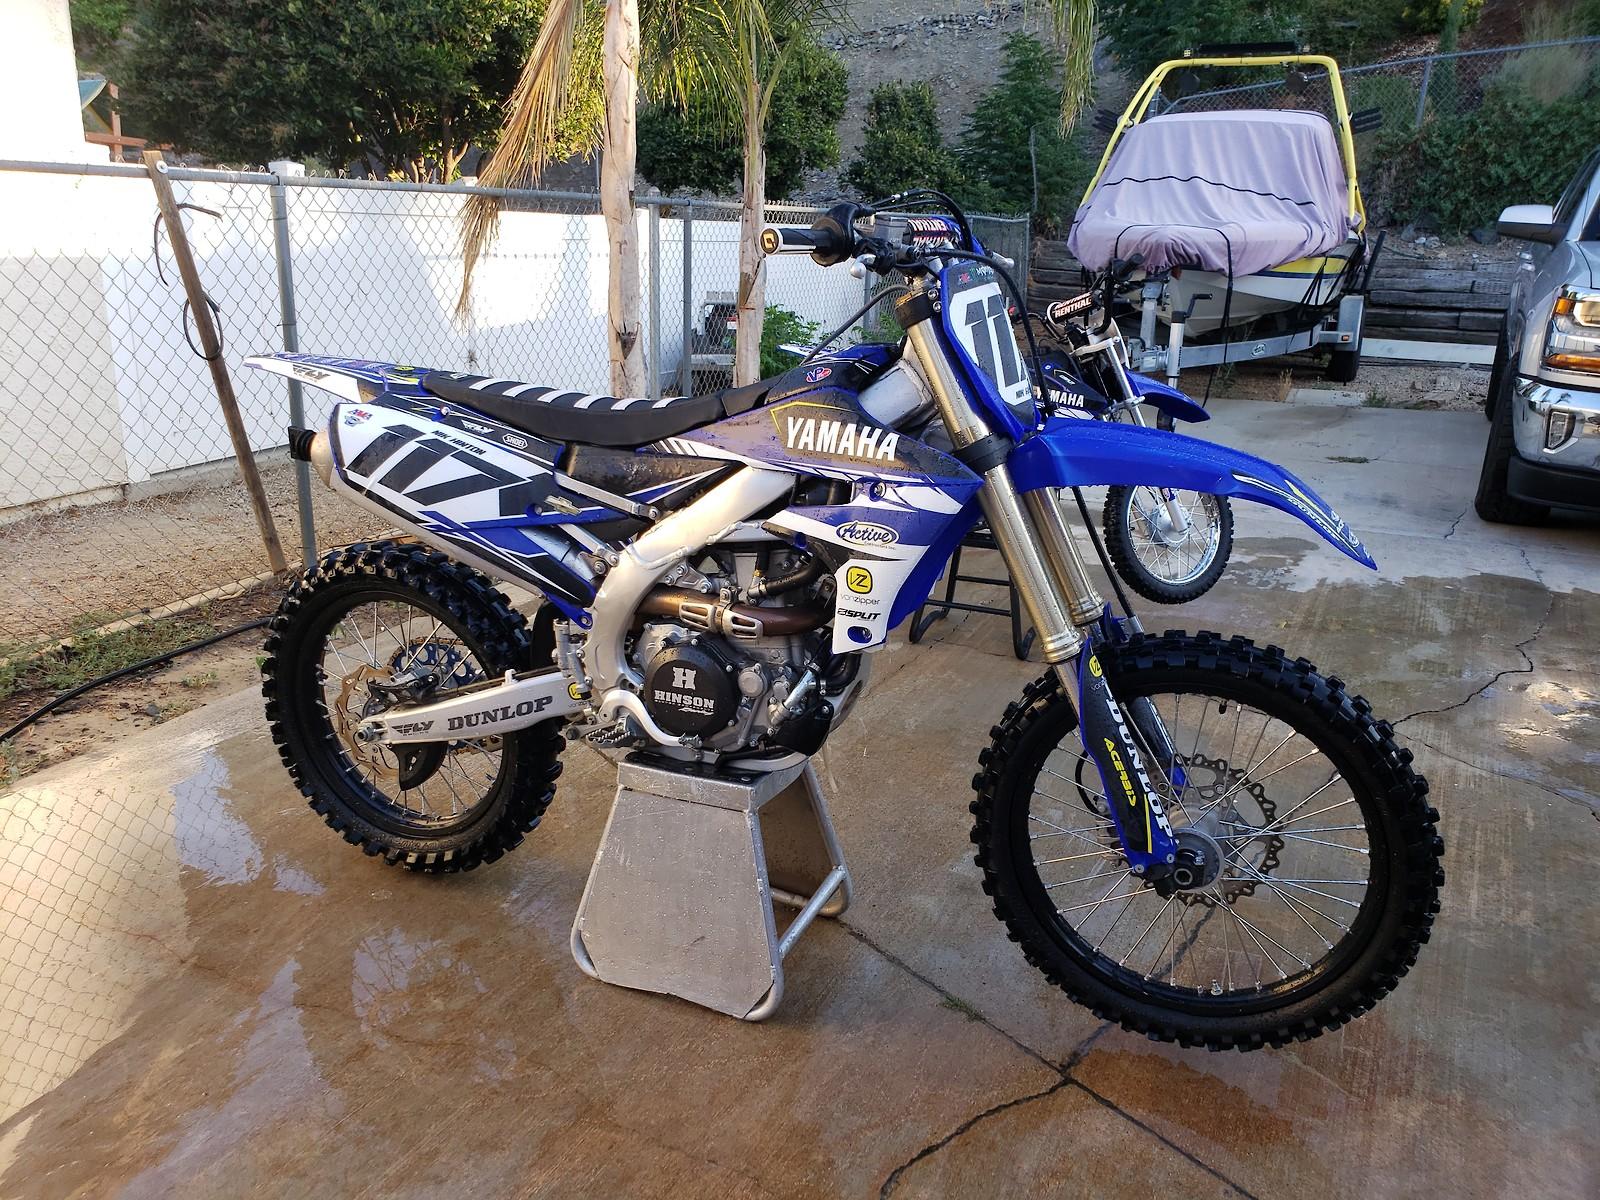 2018 yz450F $6,600 - For Sale/Bazaar - Motocross Forums